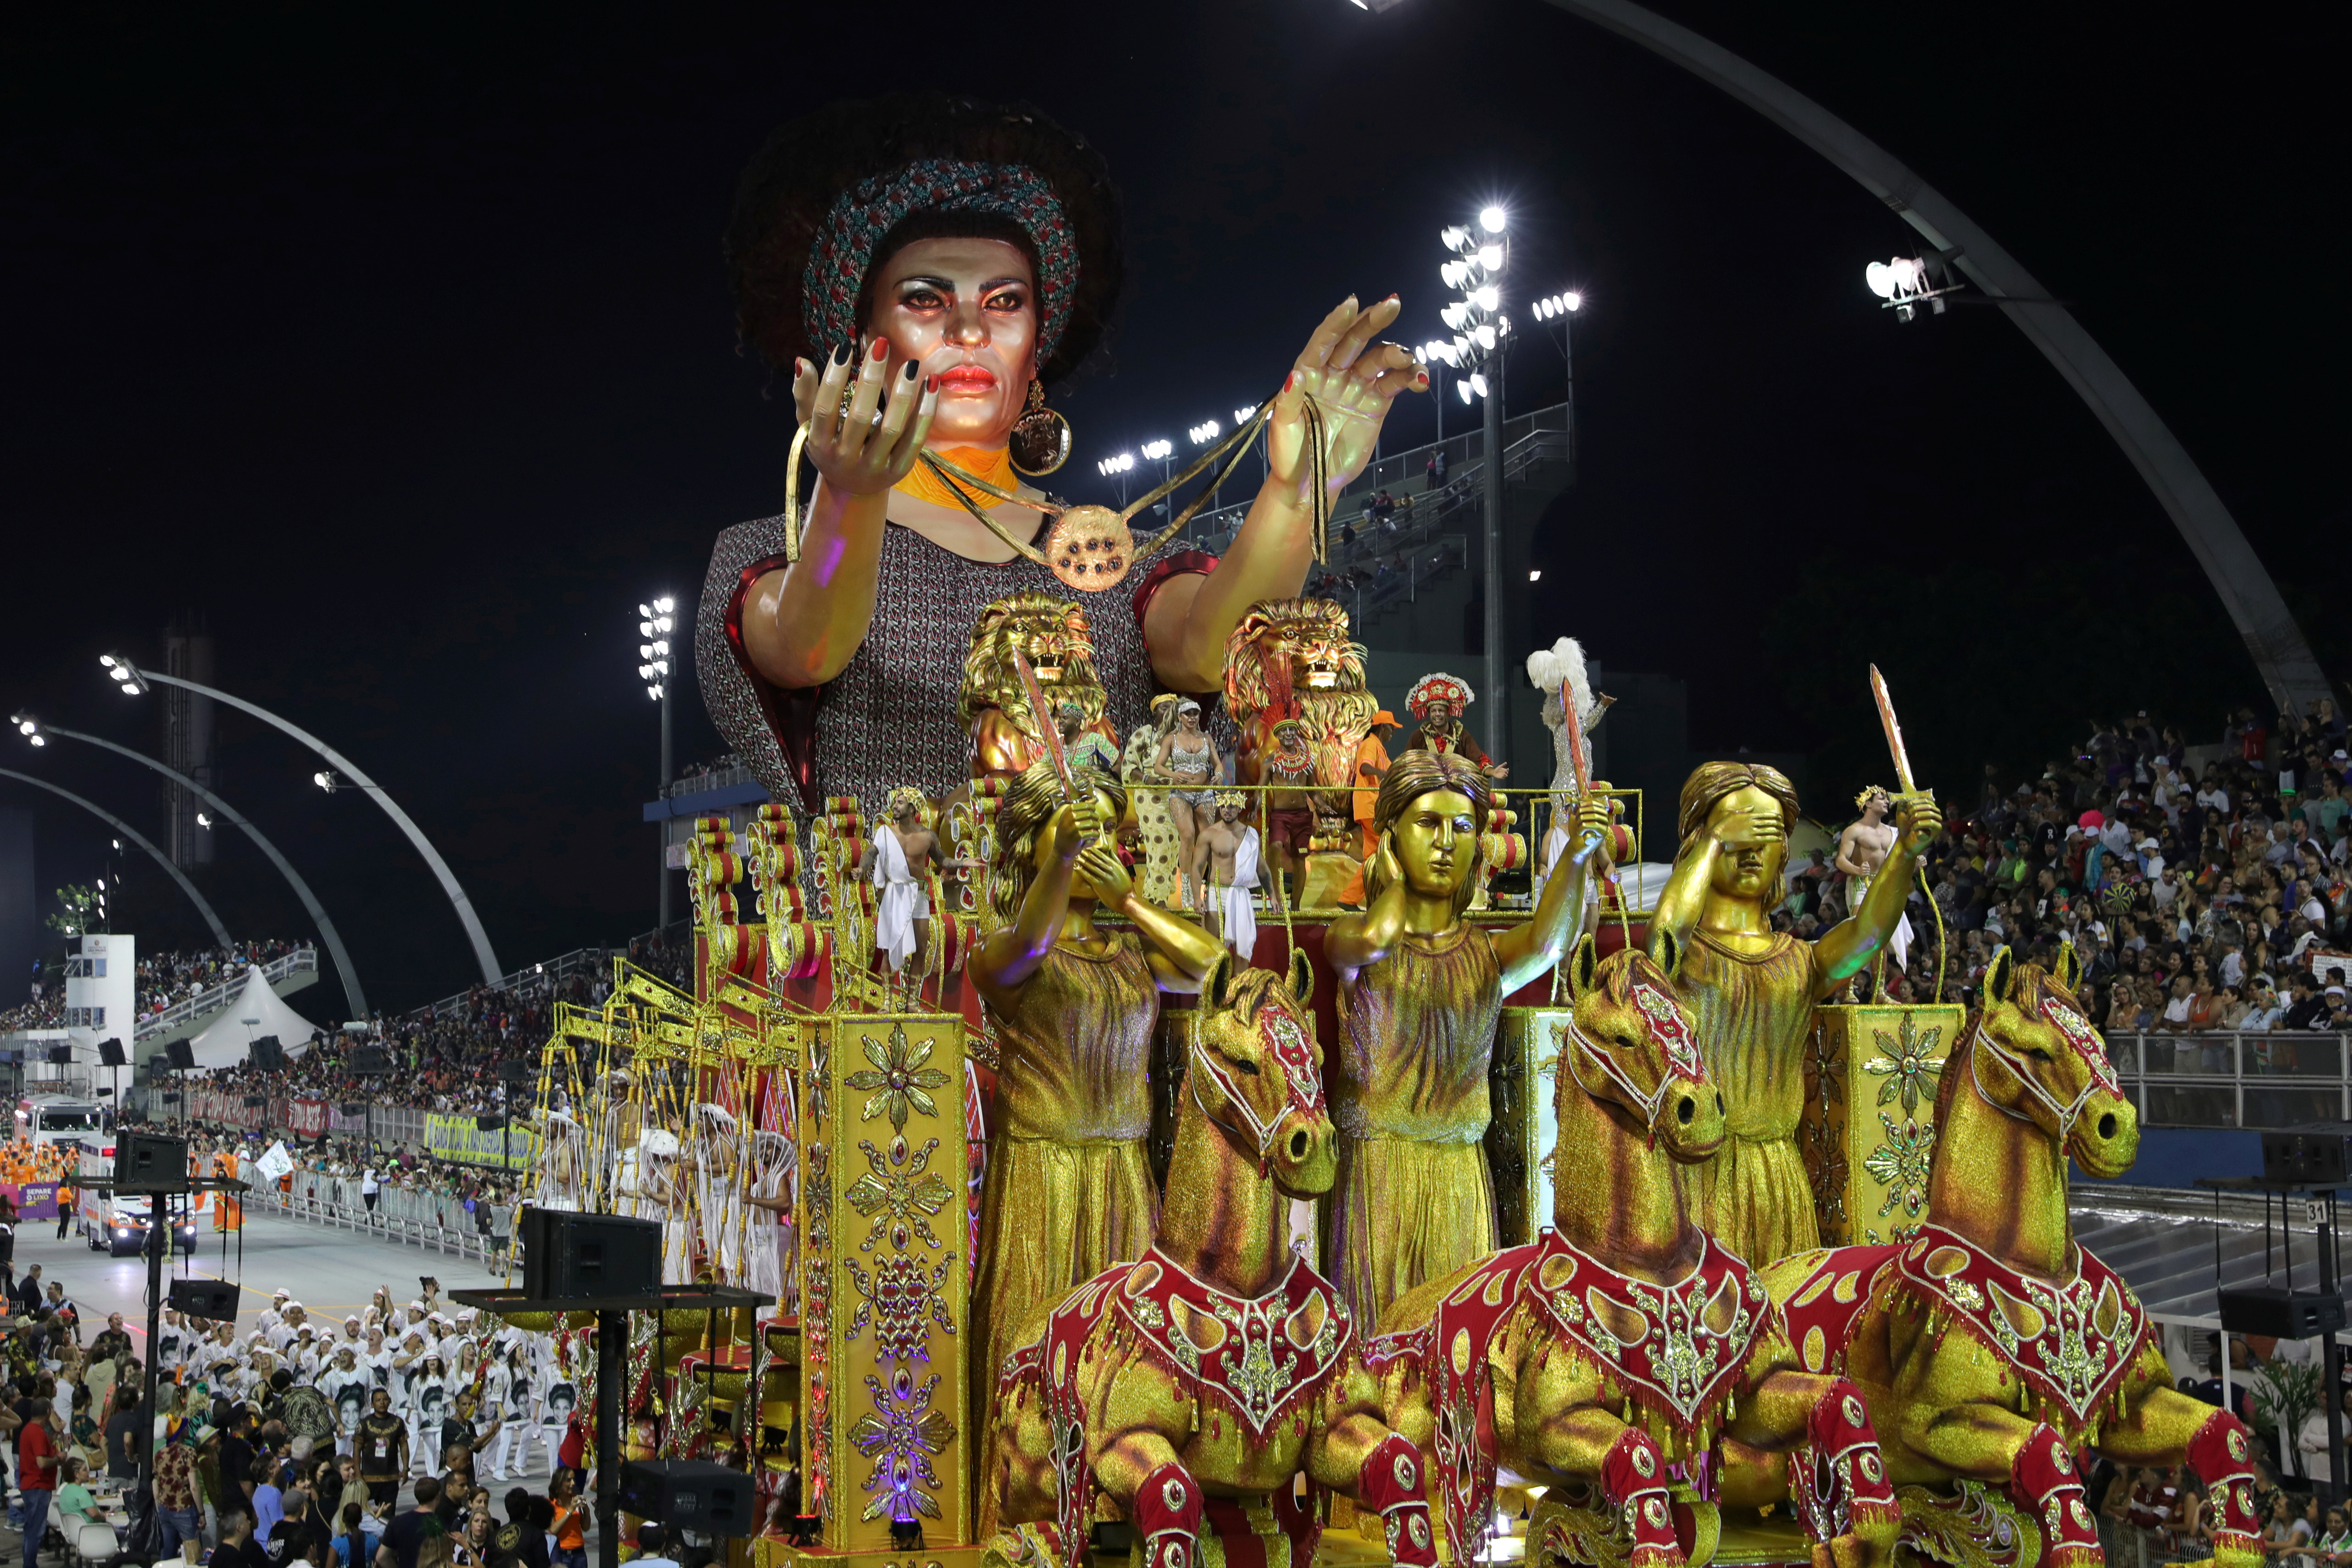 Brasil vibró al ritmo del samba en su primer día de Carnaval (REUTERS/Amanda Perobelli)